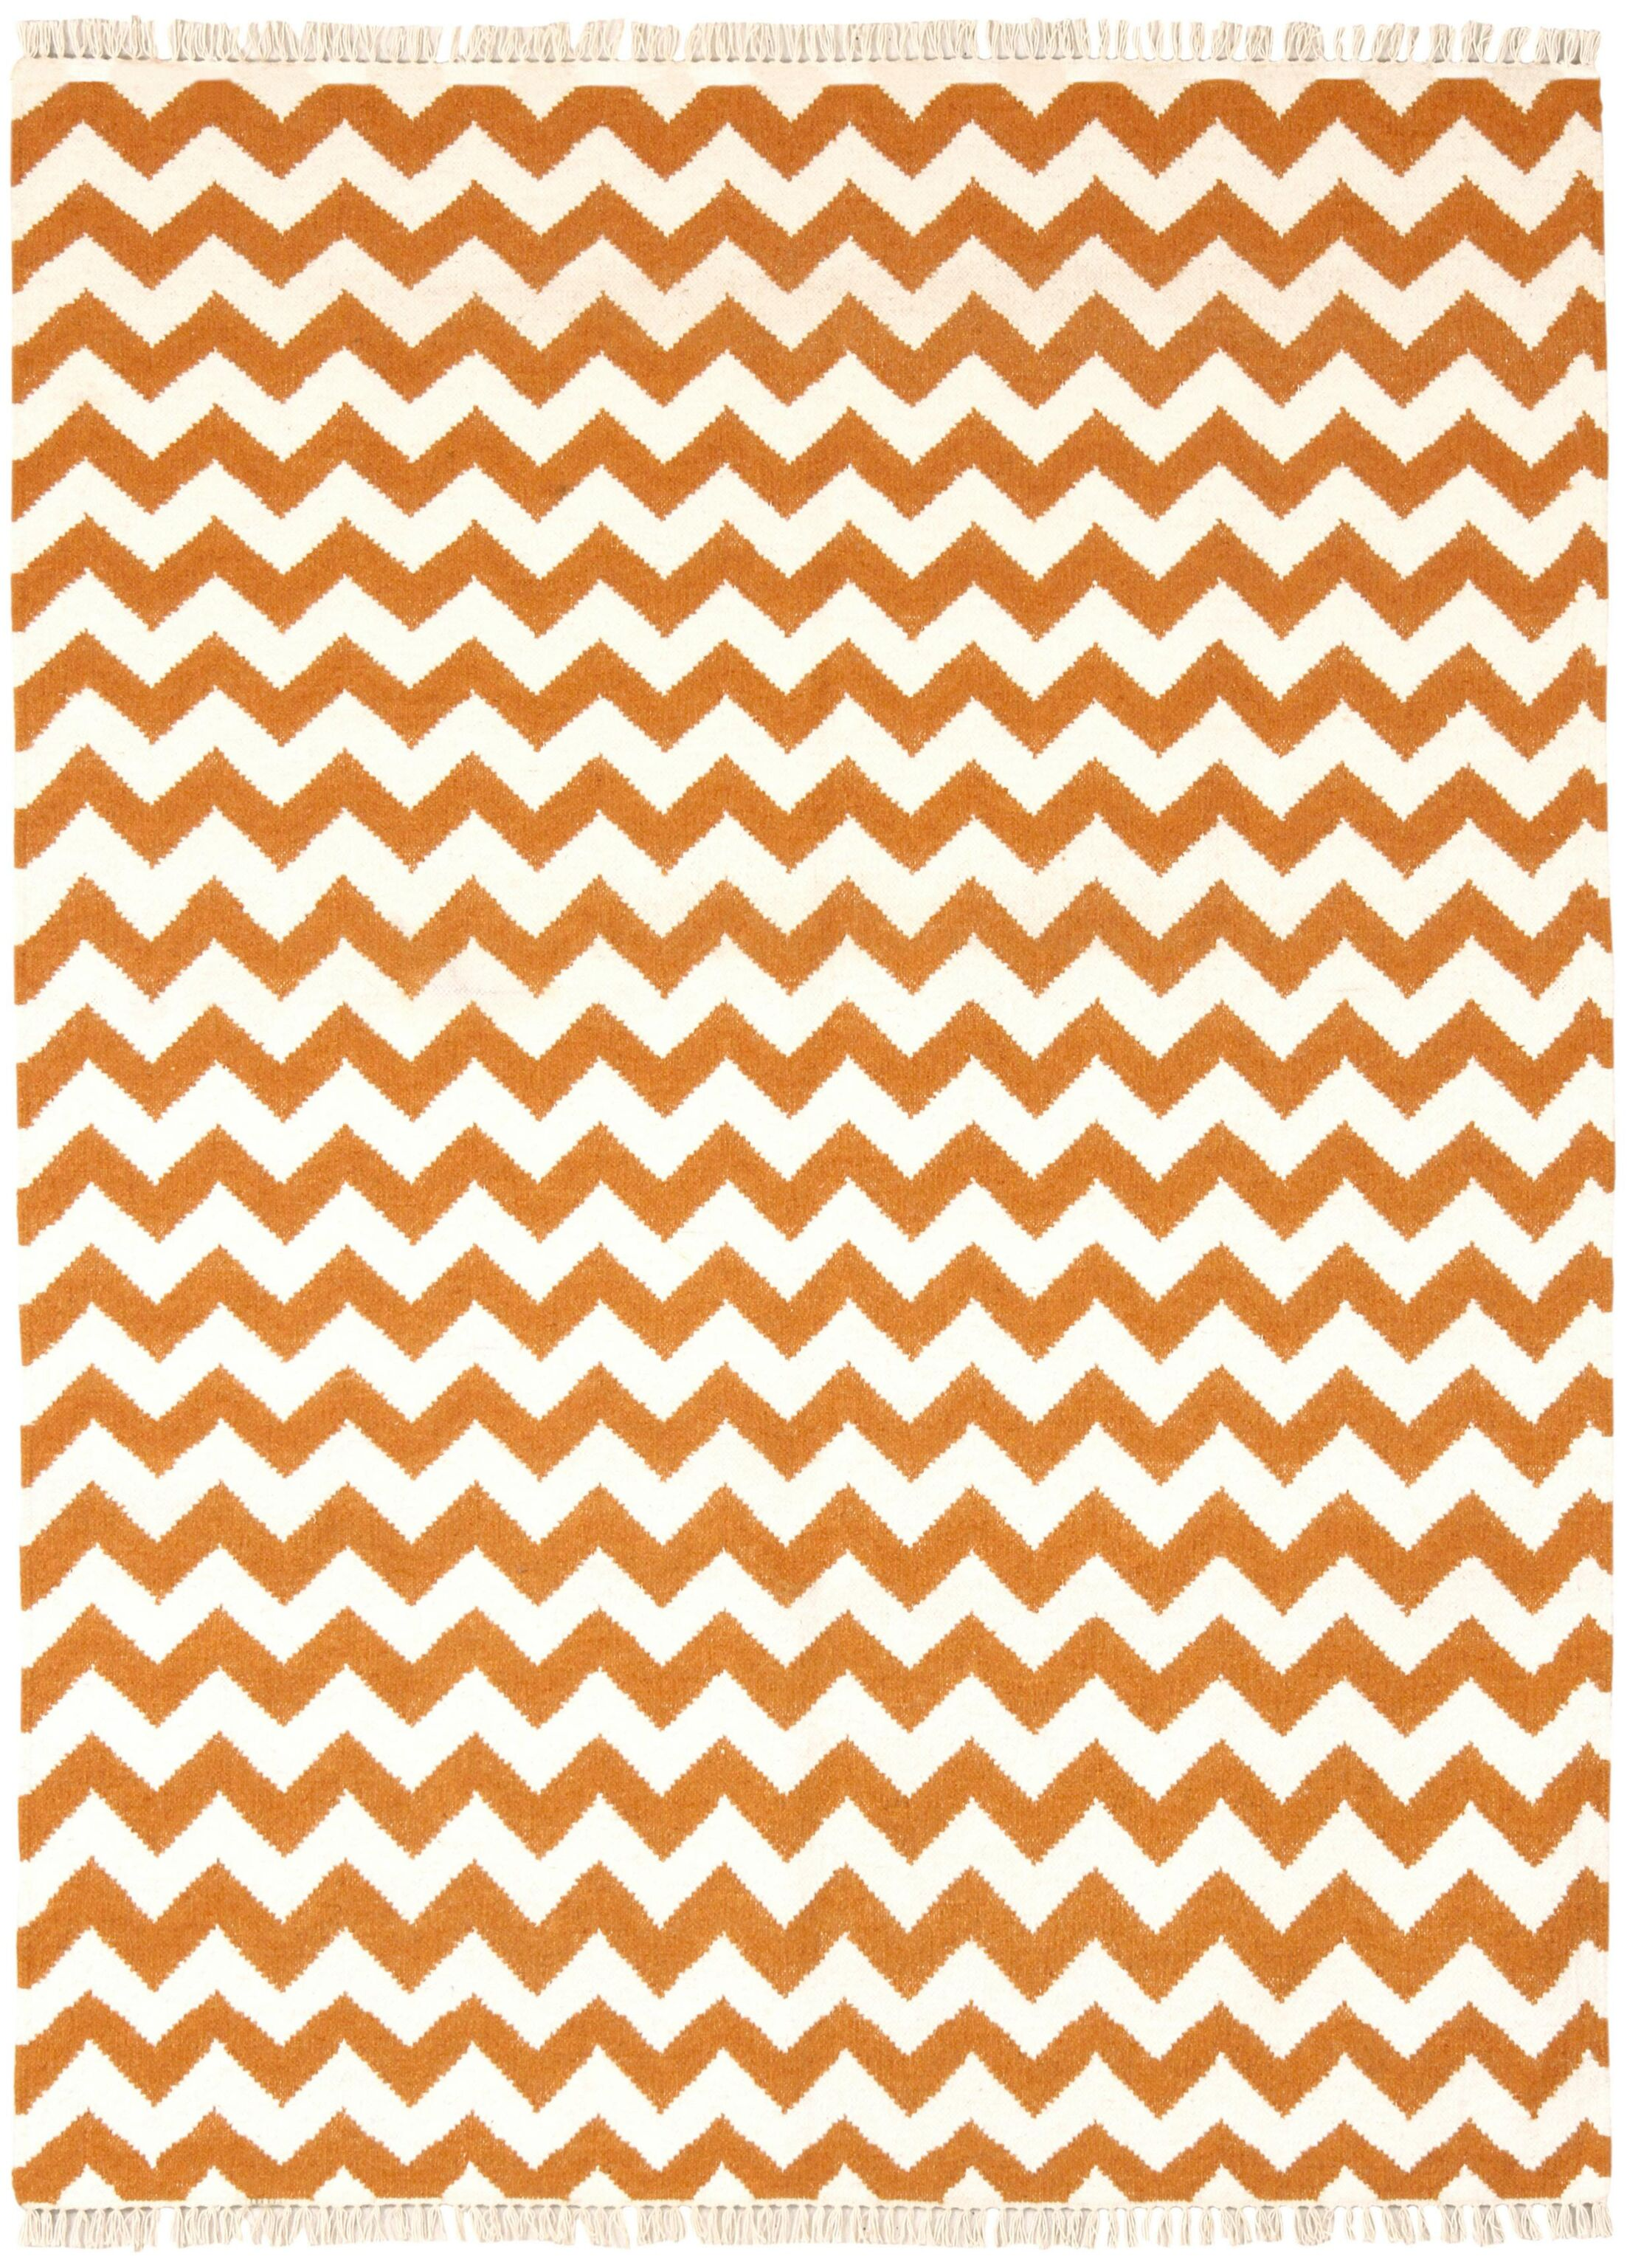 Hacienda Orange/White Chevron Area Rug Rug Size: 8' x 10'